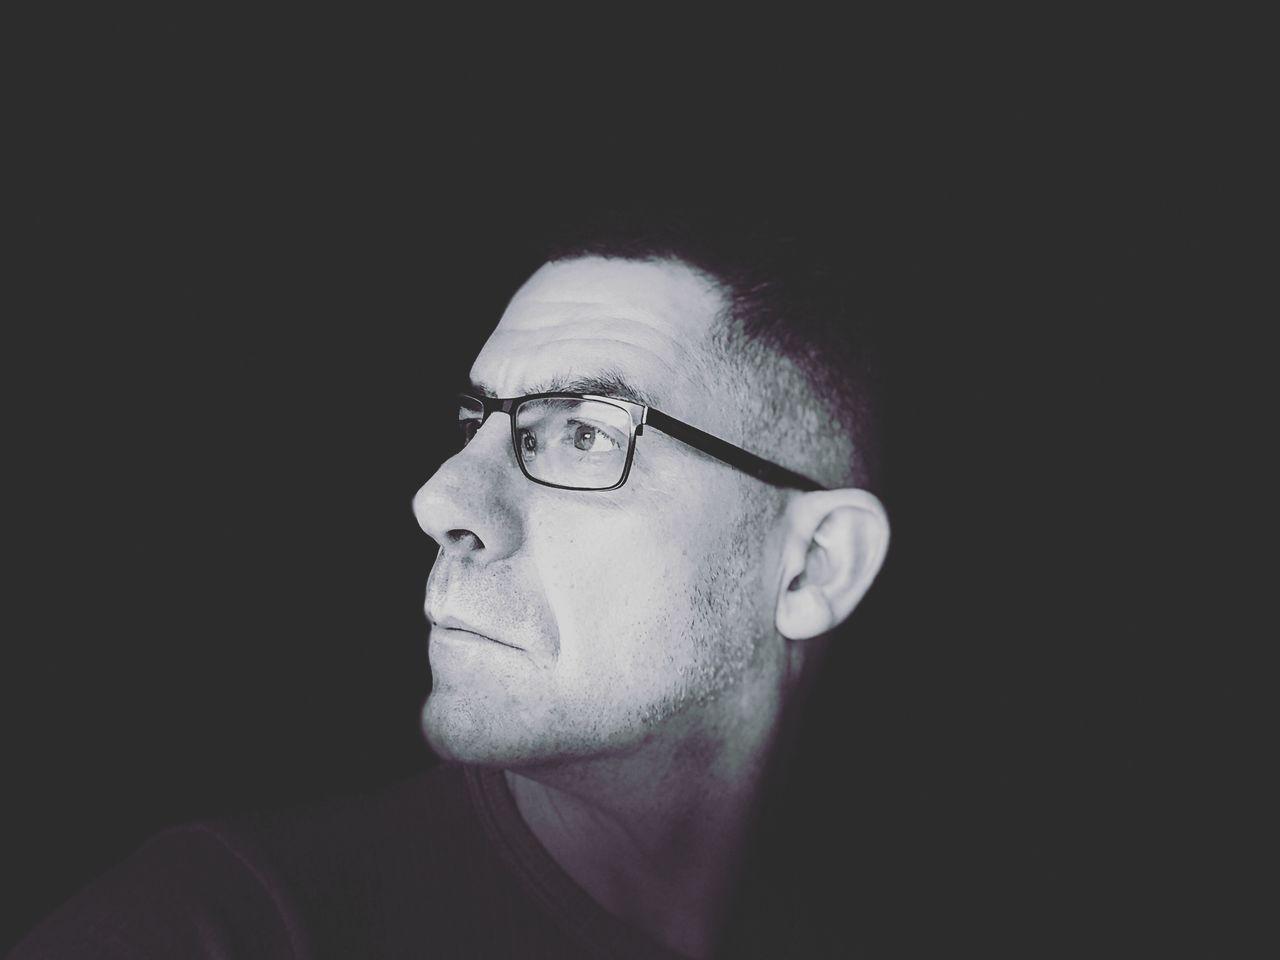 Close-Up Of Thoughtful Mature Man Wearing Eyeglasses Against Black Background